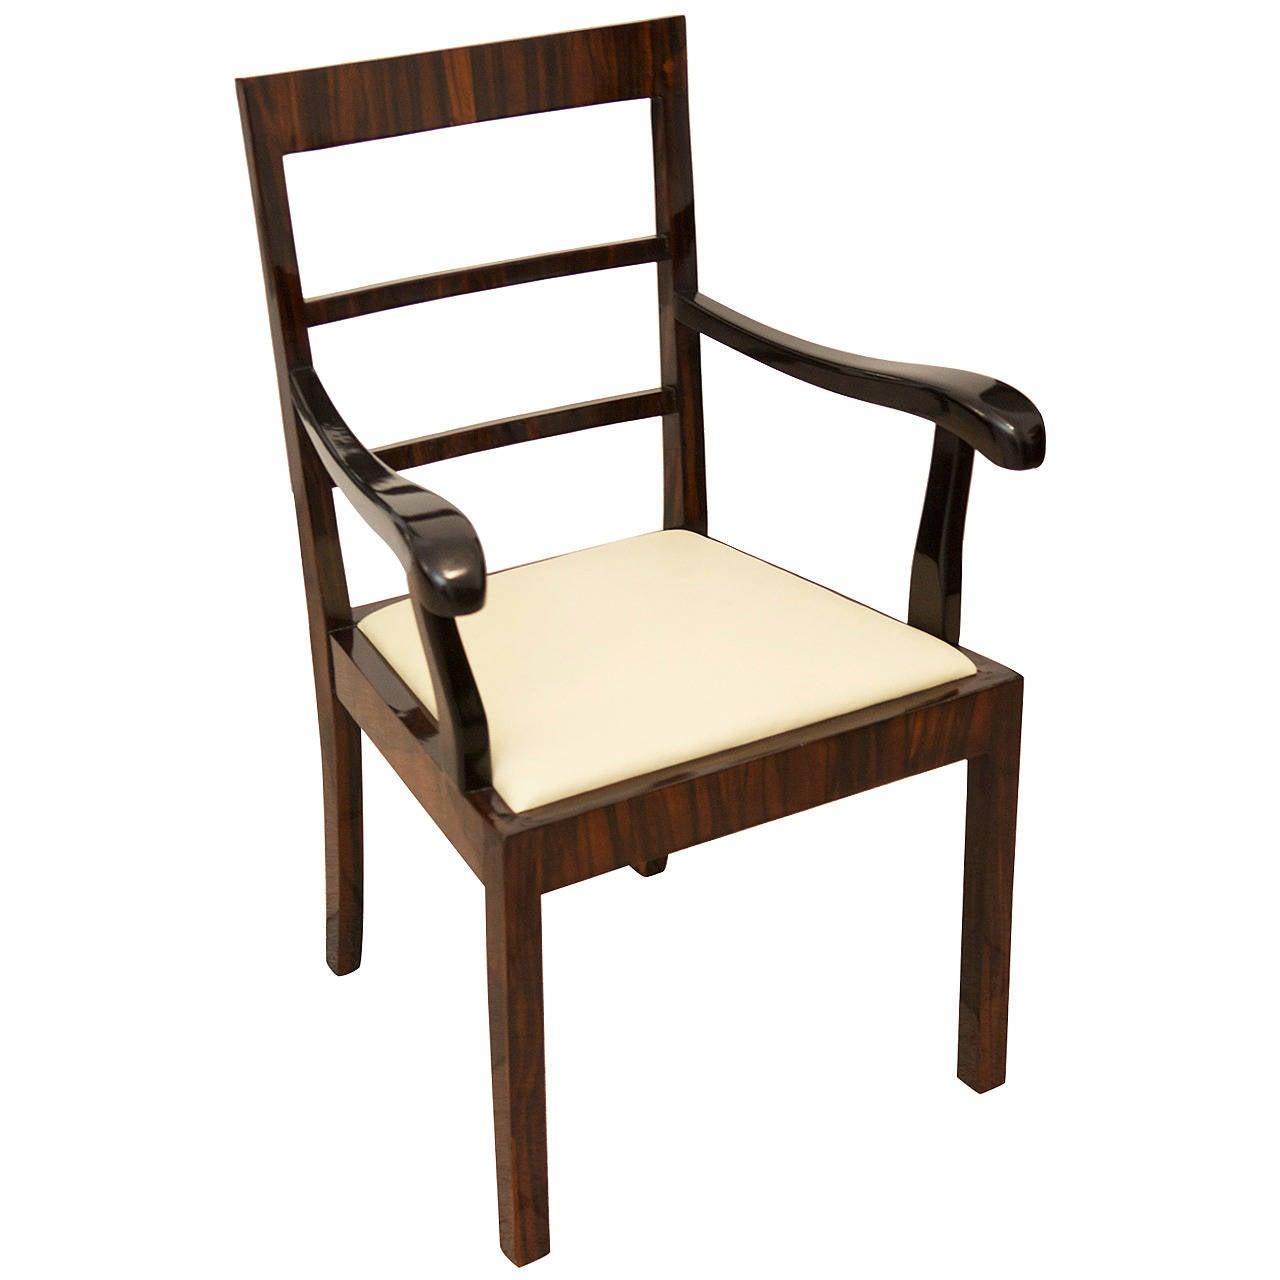 desk chair utm parson covers etsy art deco macassar ebony at 1stdibs